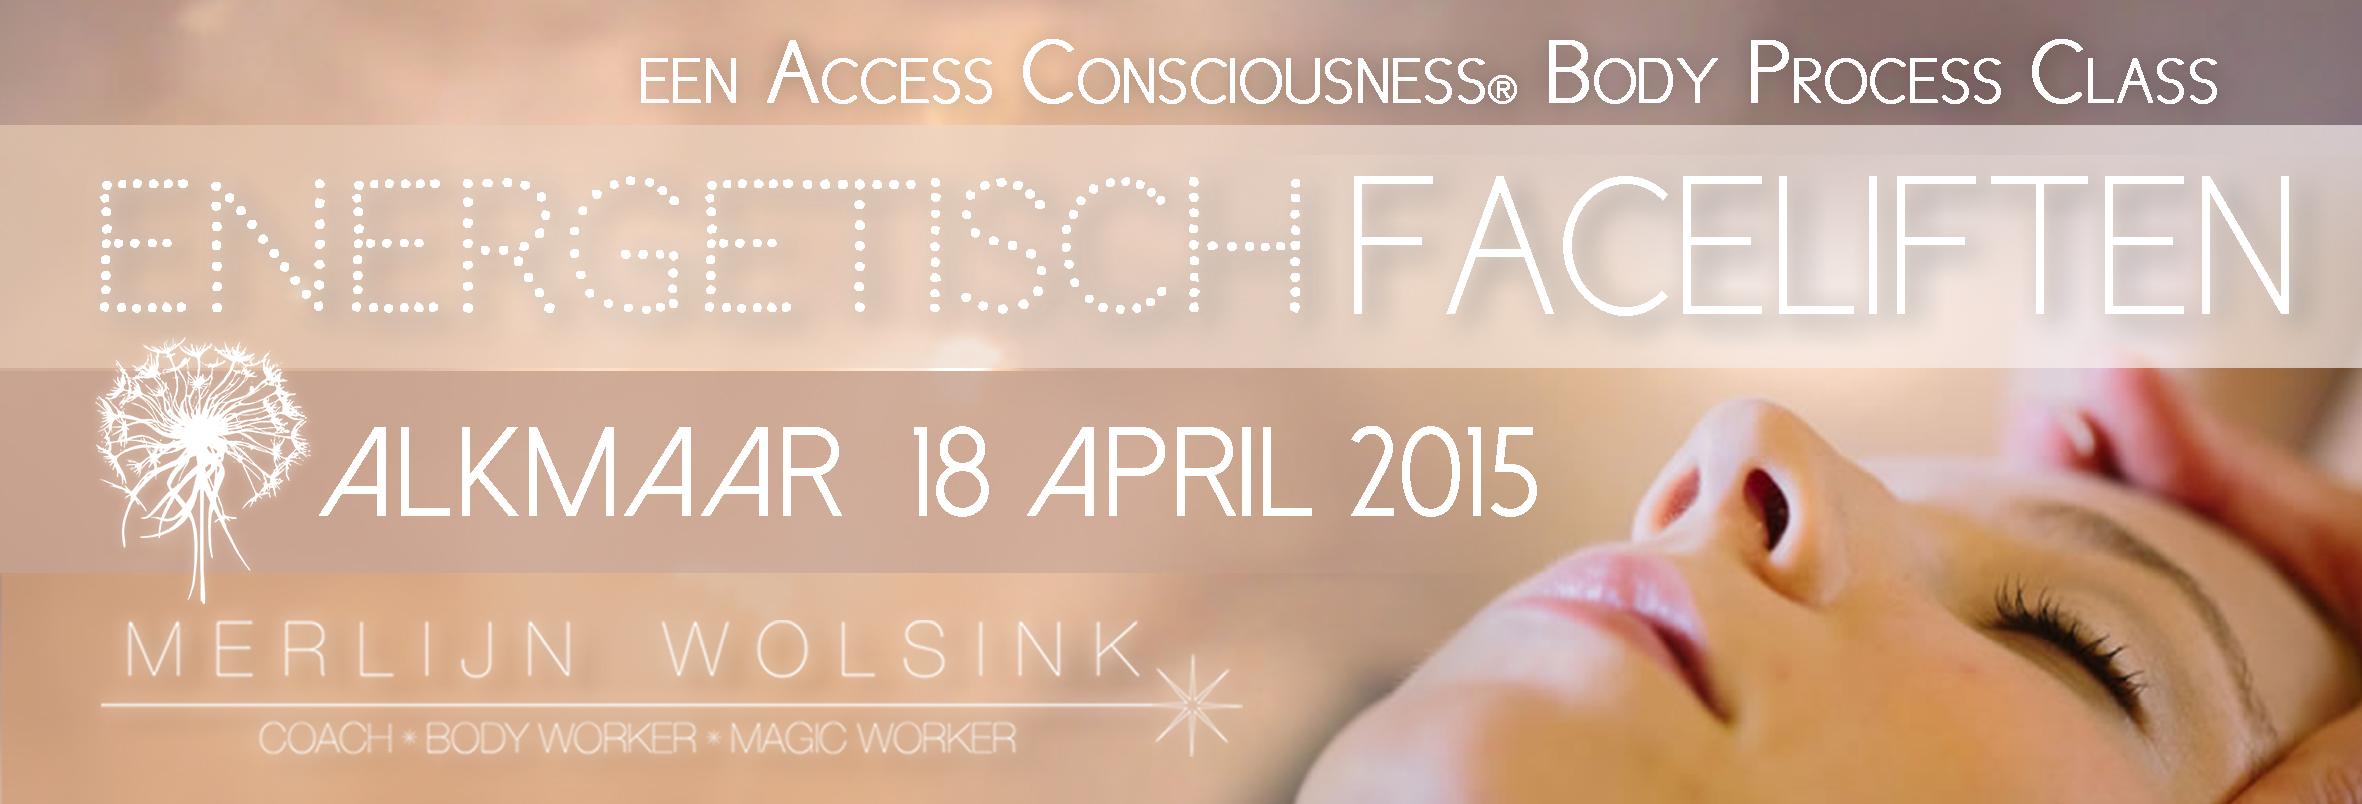 Access Facelift - Merlijn Wolsink